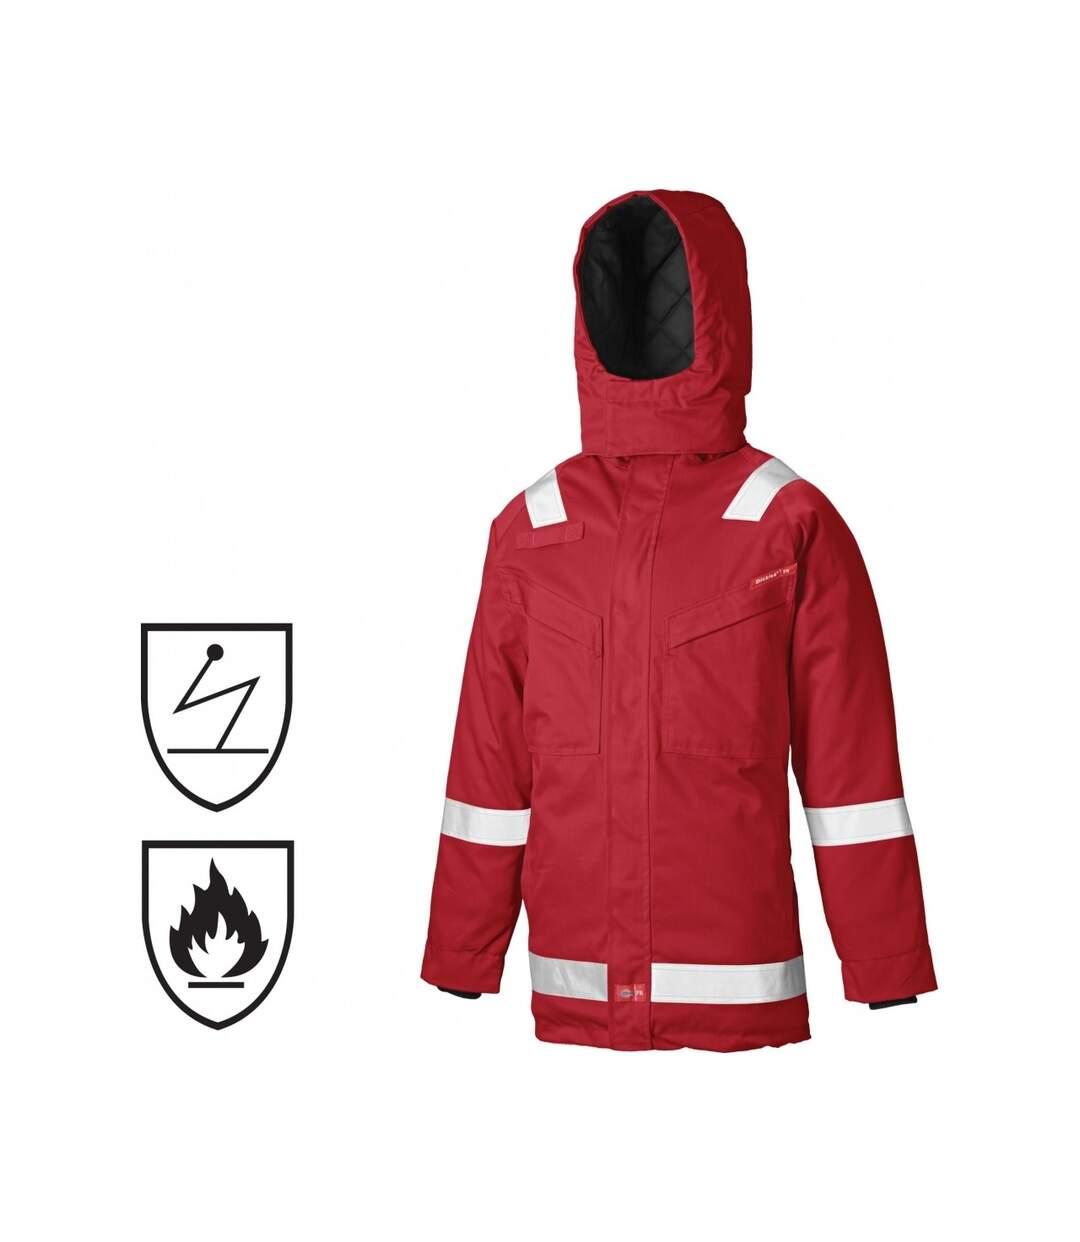 Dickies Mens Pyrovatex Flame Retardant Antistatic Parka Jacket (Red) - UTDK165